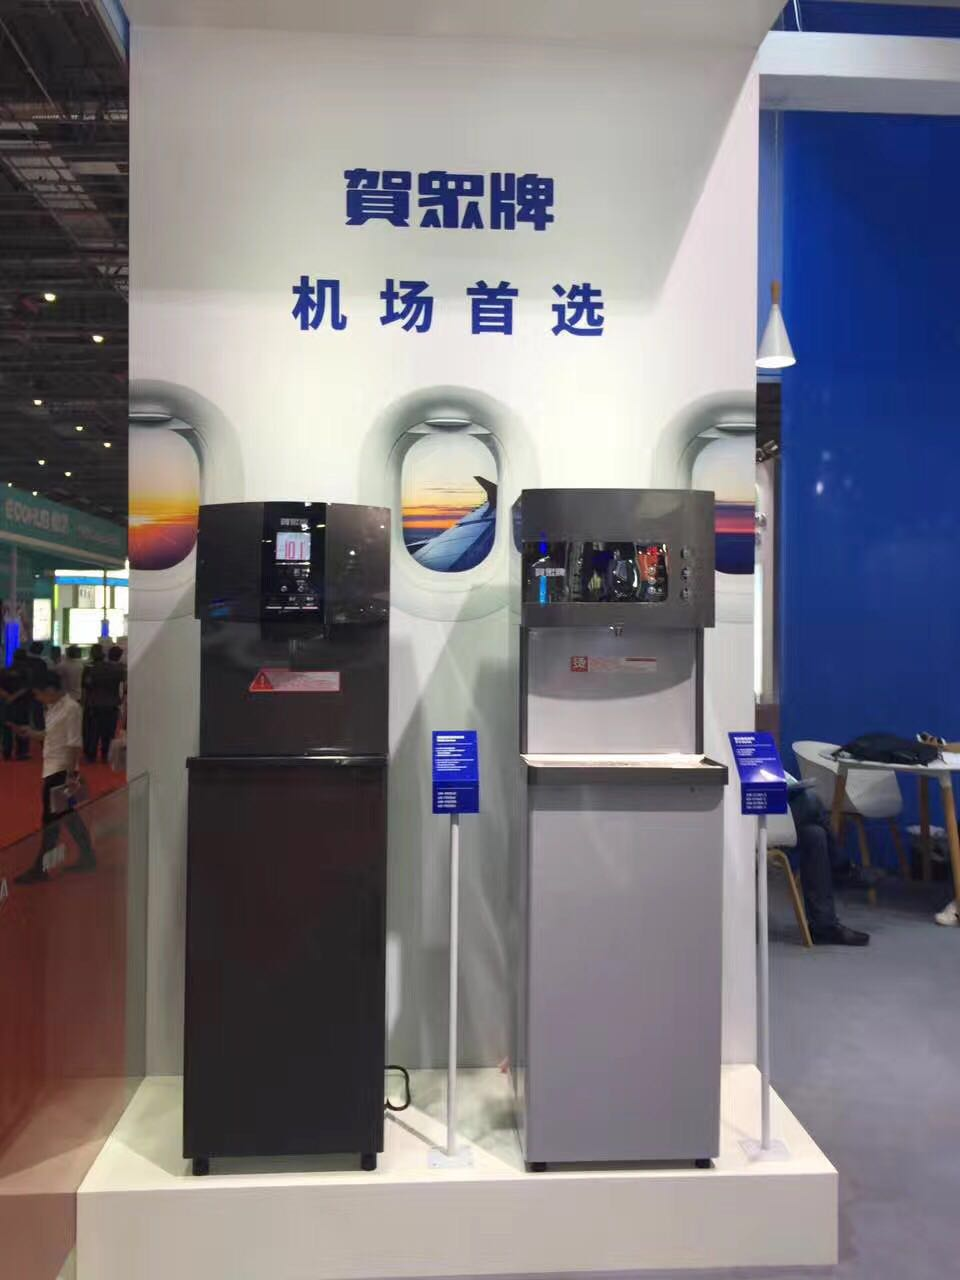 betway必威app_四川betway必威app成都betway必威app牌饮水机受邀参加上海国际水展会